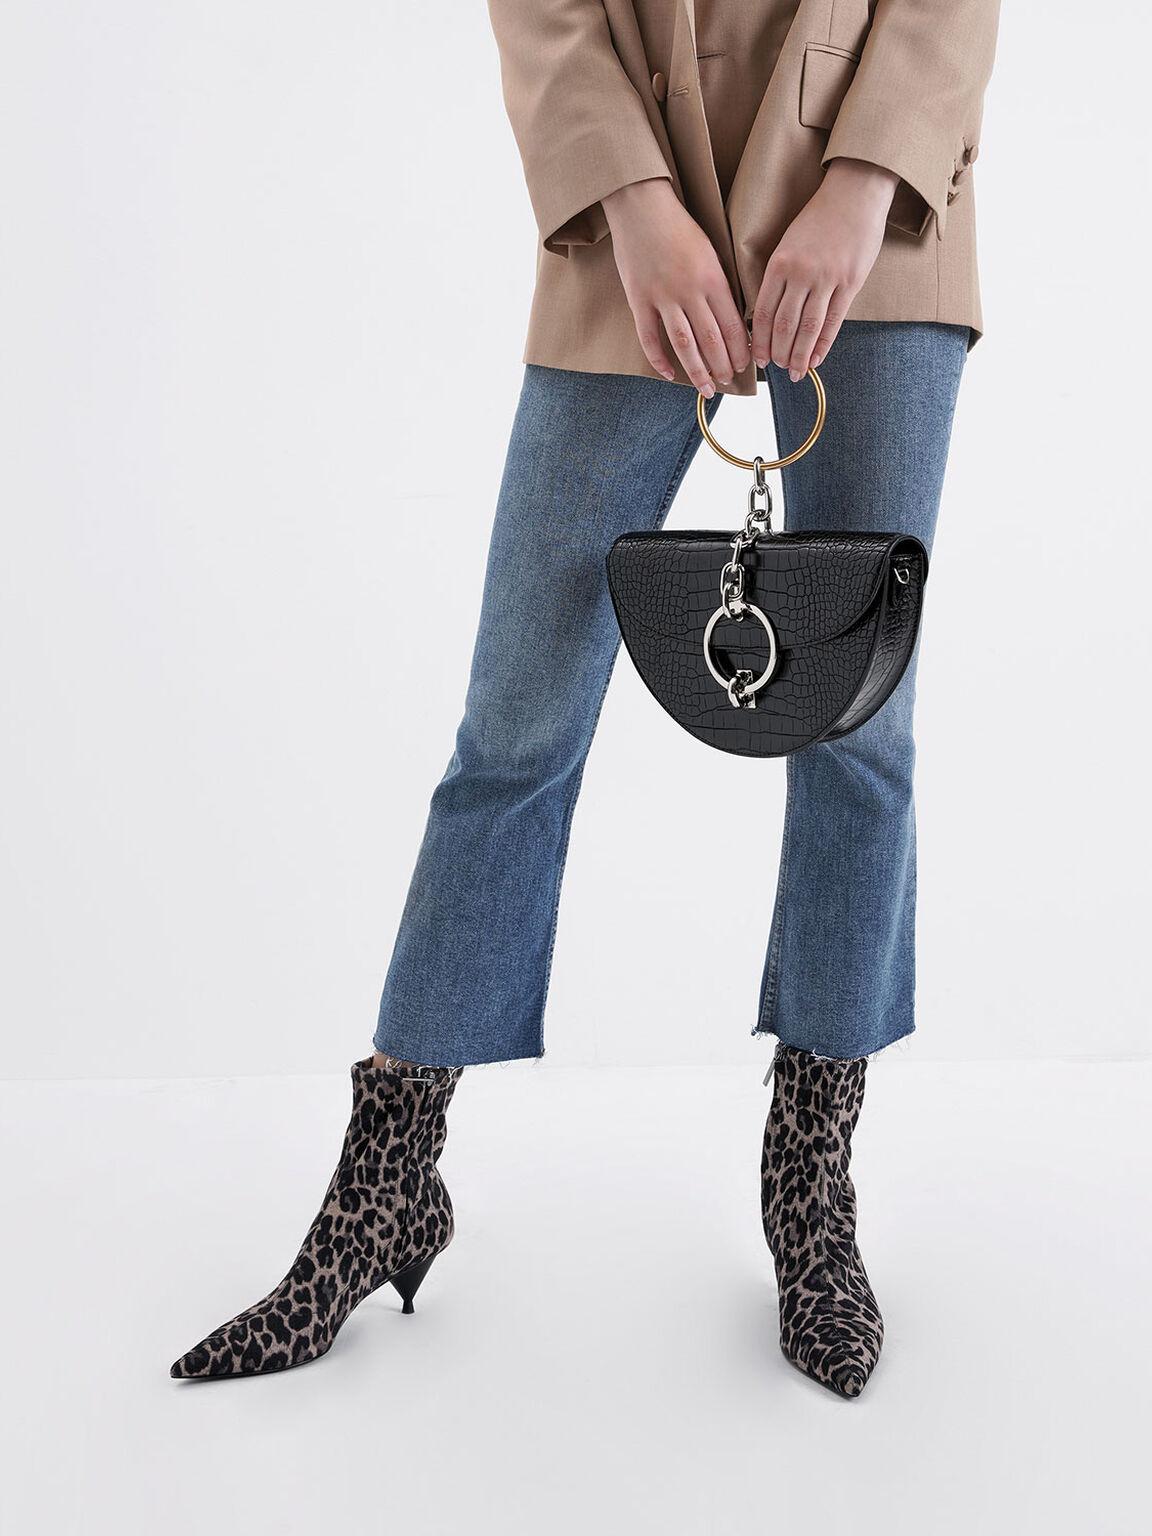 豹紋尖頭短靴, 混色, hi-res